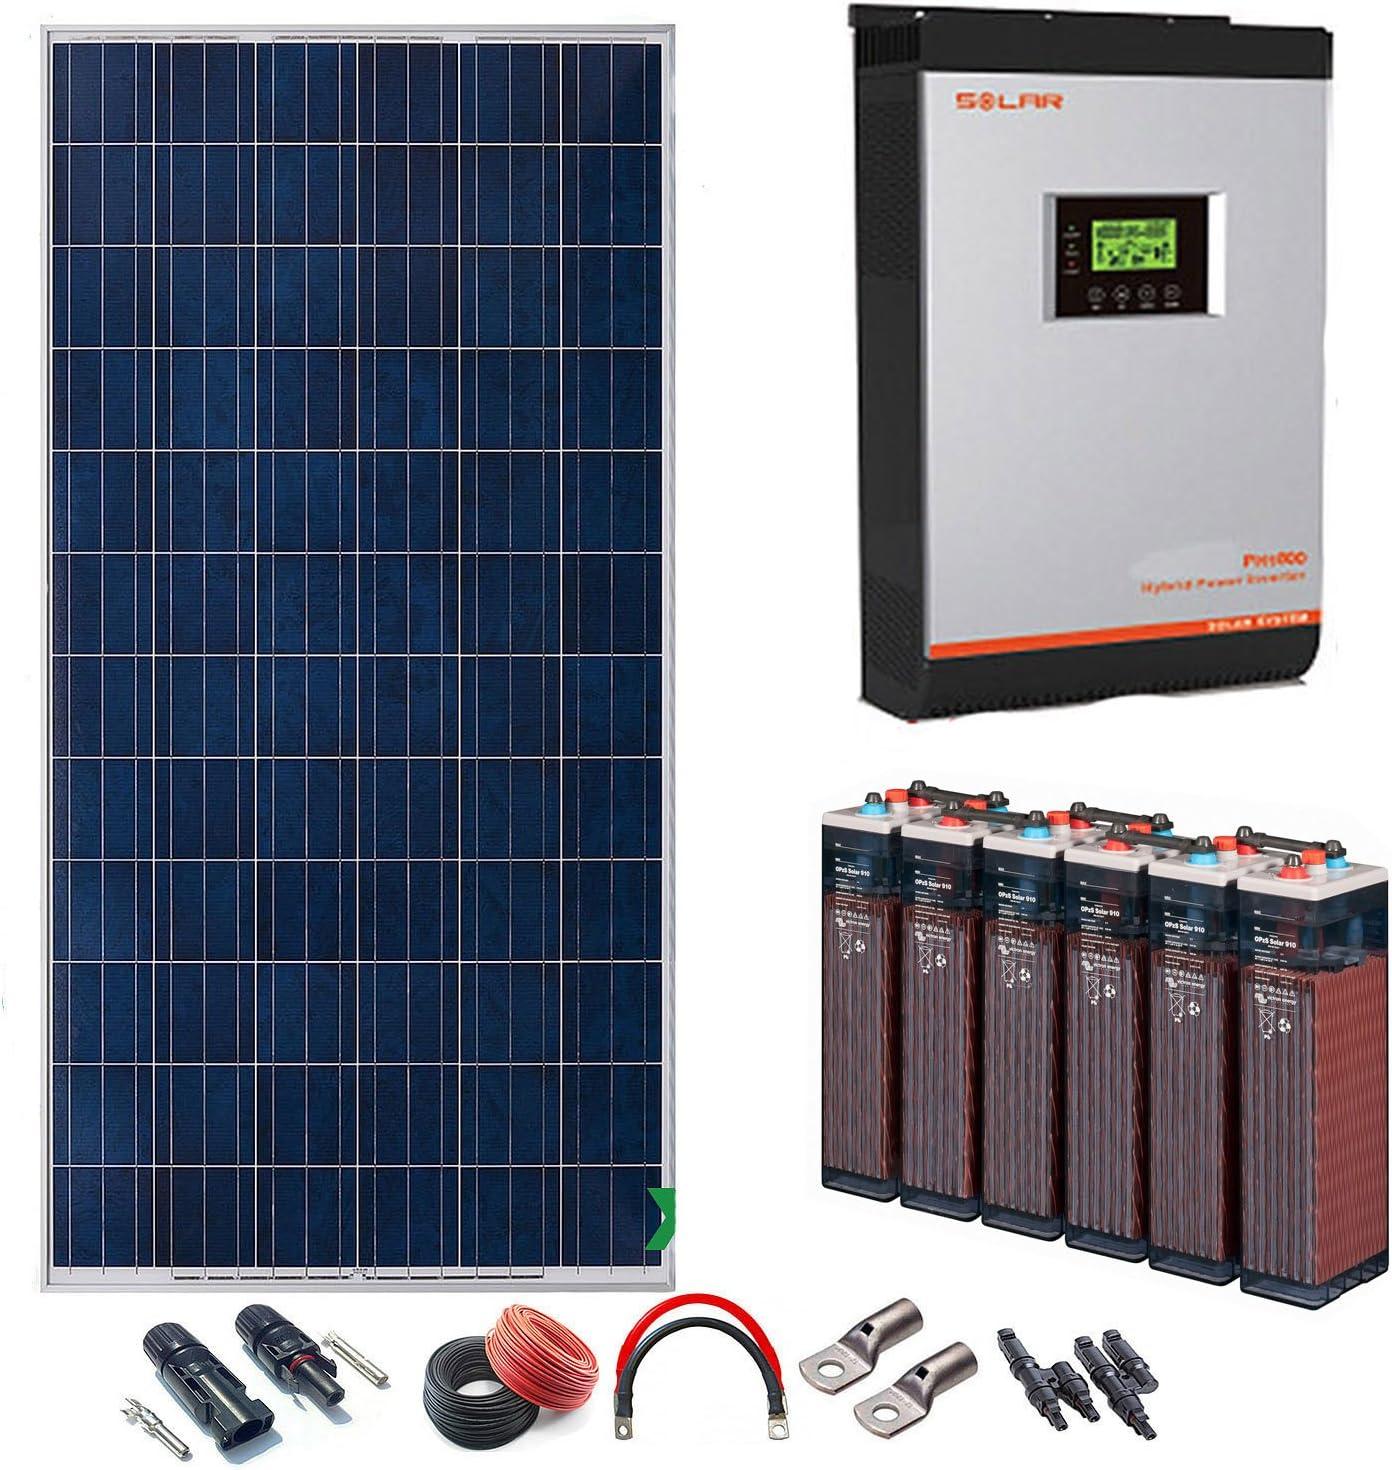 Kit Solar 48v 2000w/10000w día Batería 6OPzS 900Ah Inversor Multifunción 5kva Regulador MPPT 60A